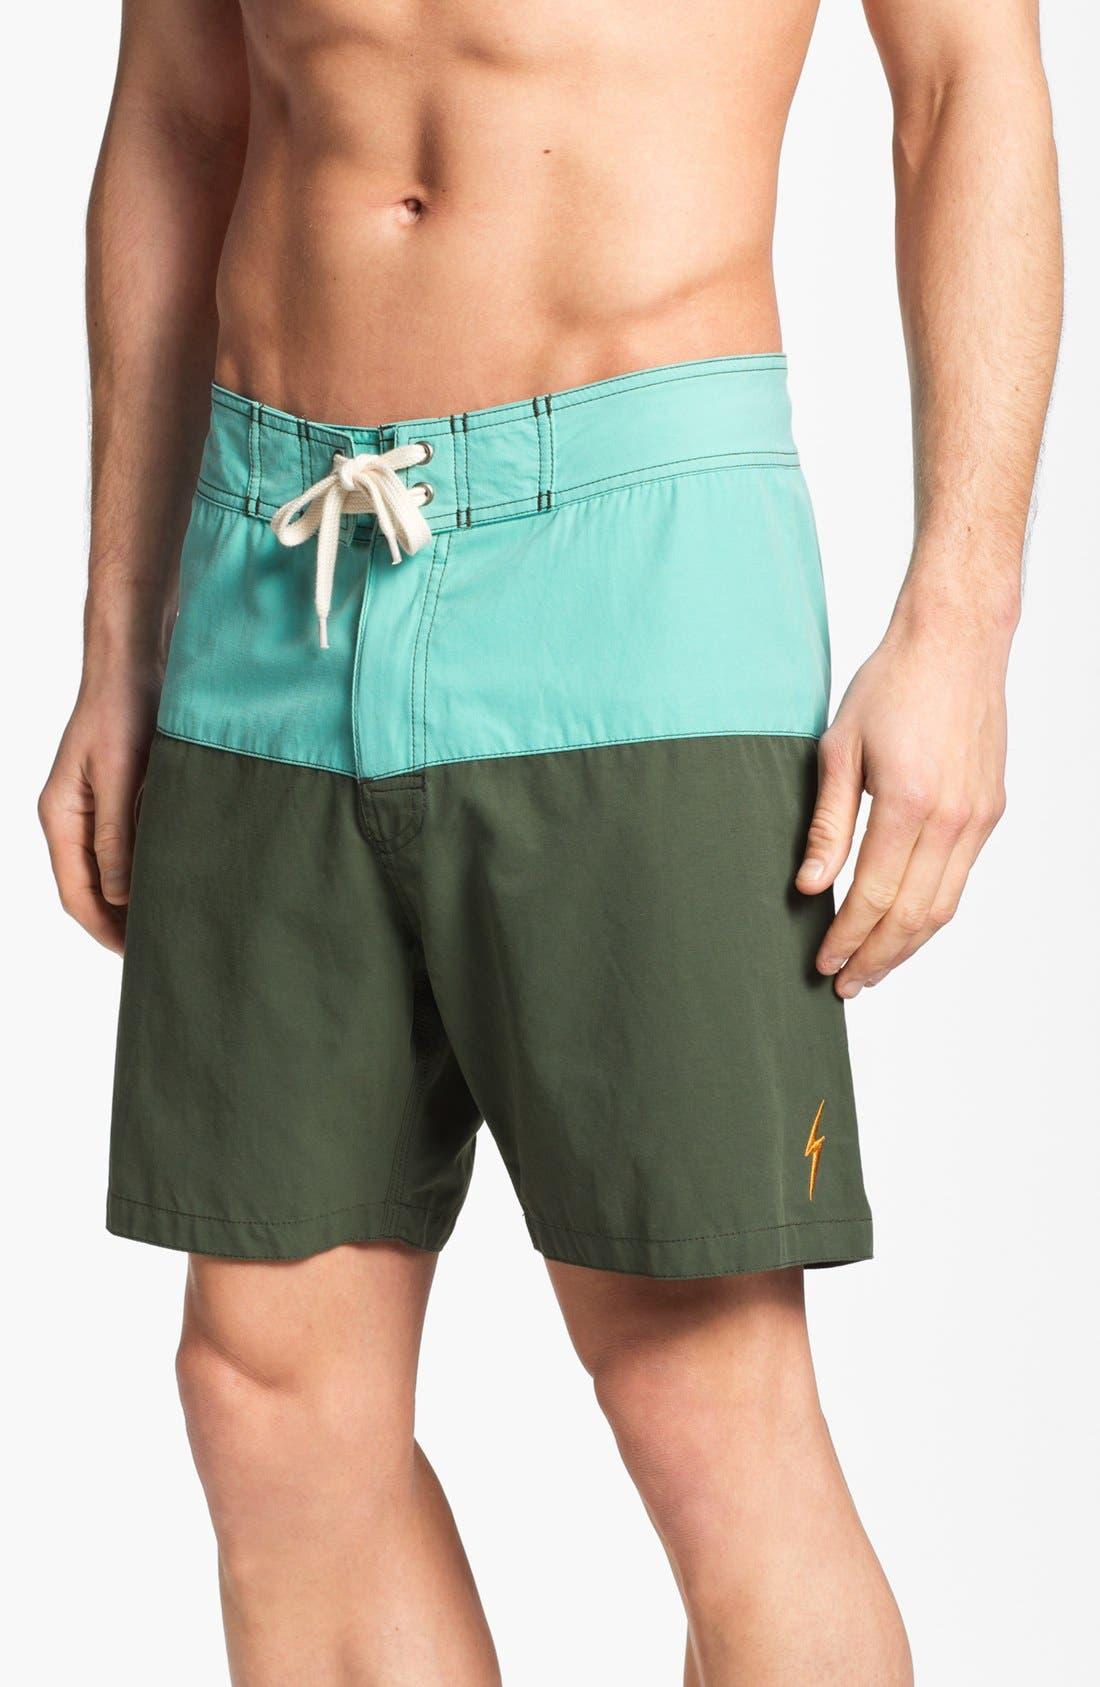 LIGHTNING BOLT,                             'Surfari' Board Shorts,                             Main thumbnail 1, color,                             440